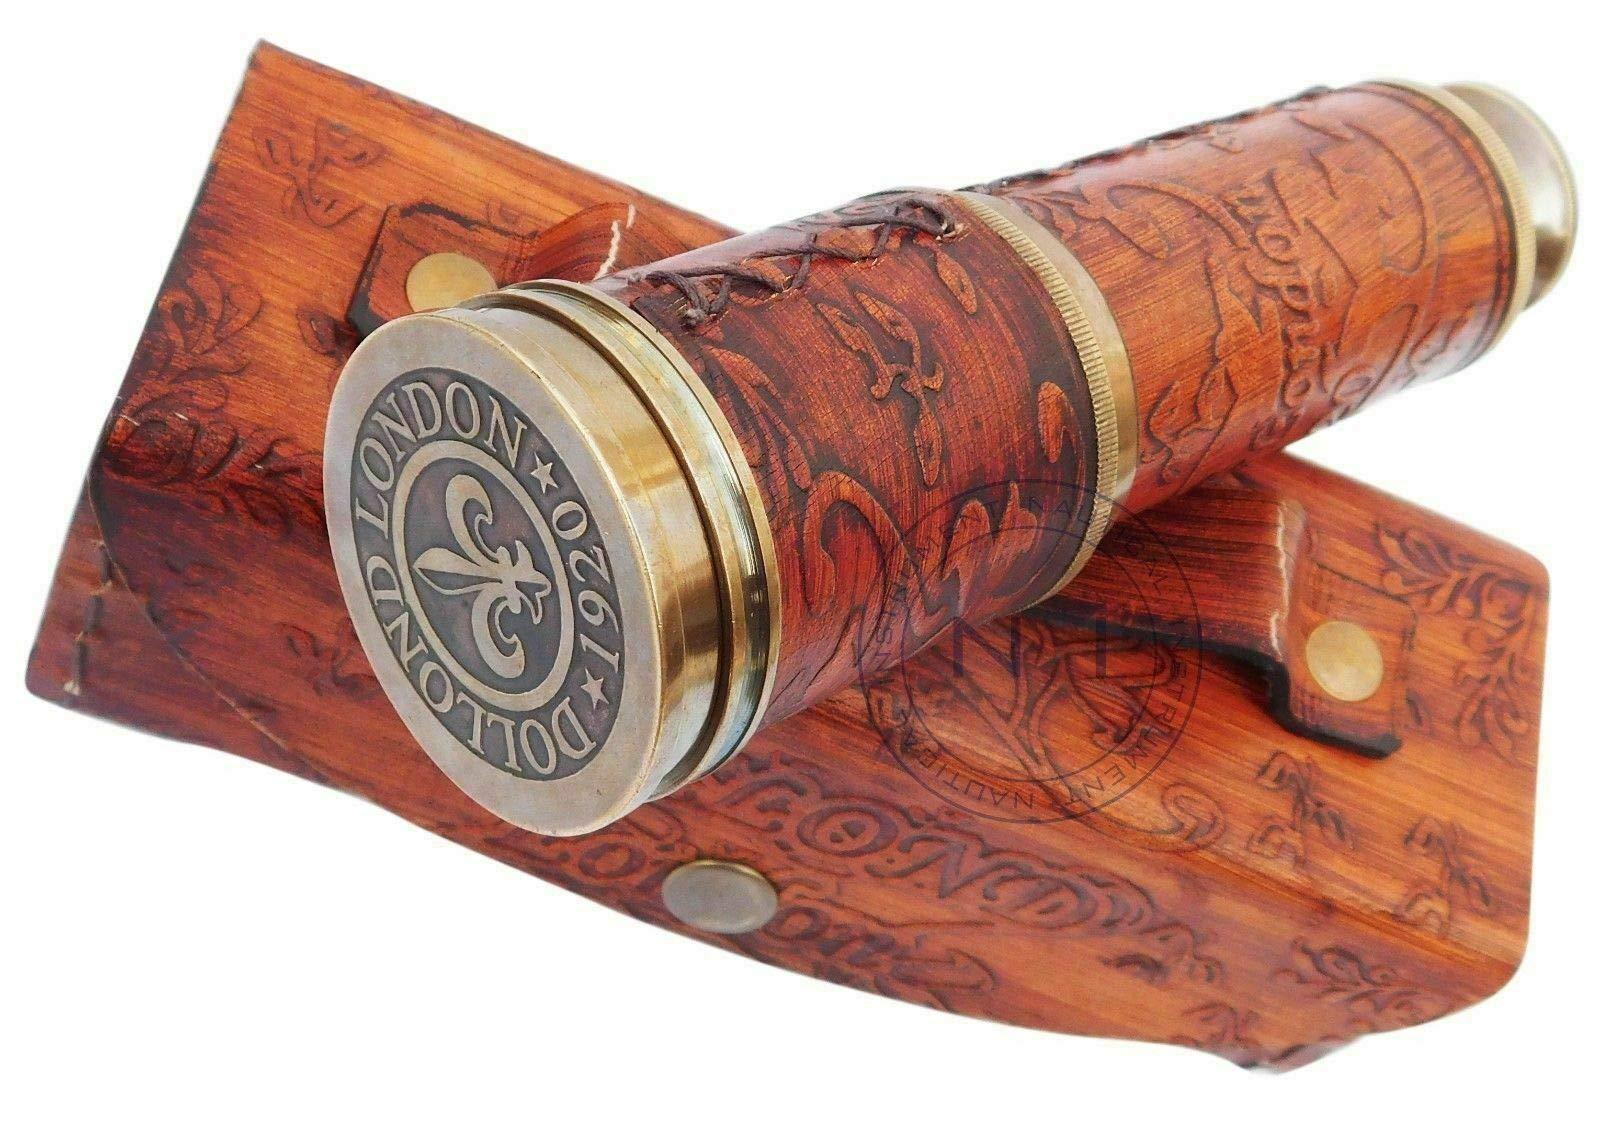 PIRU Antique-Brass-Telescope-Marine-Nautical-Leather-Pirate-Spyglass-Vintage-Scope